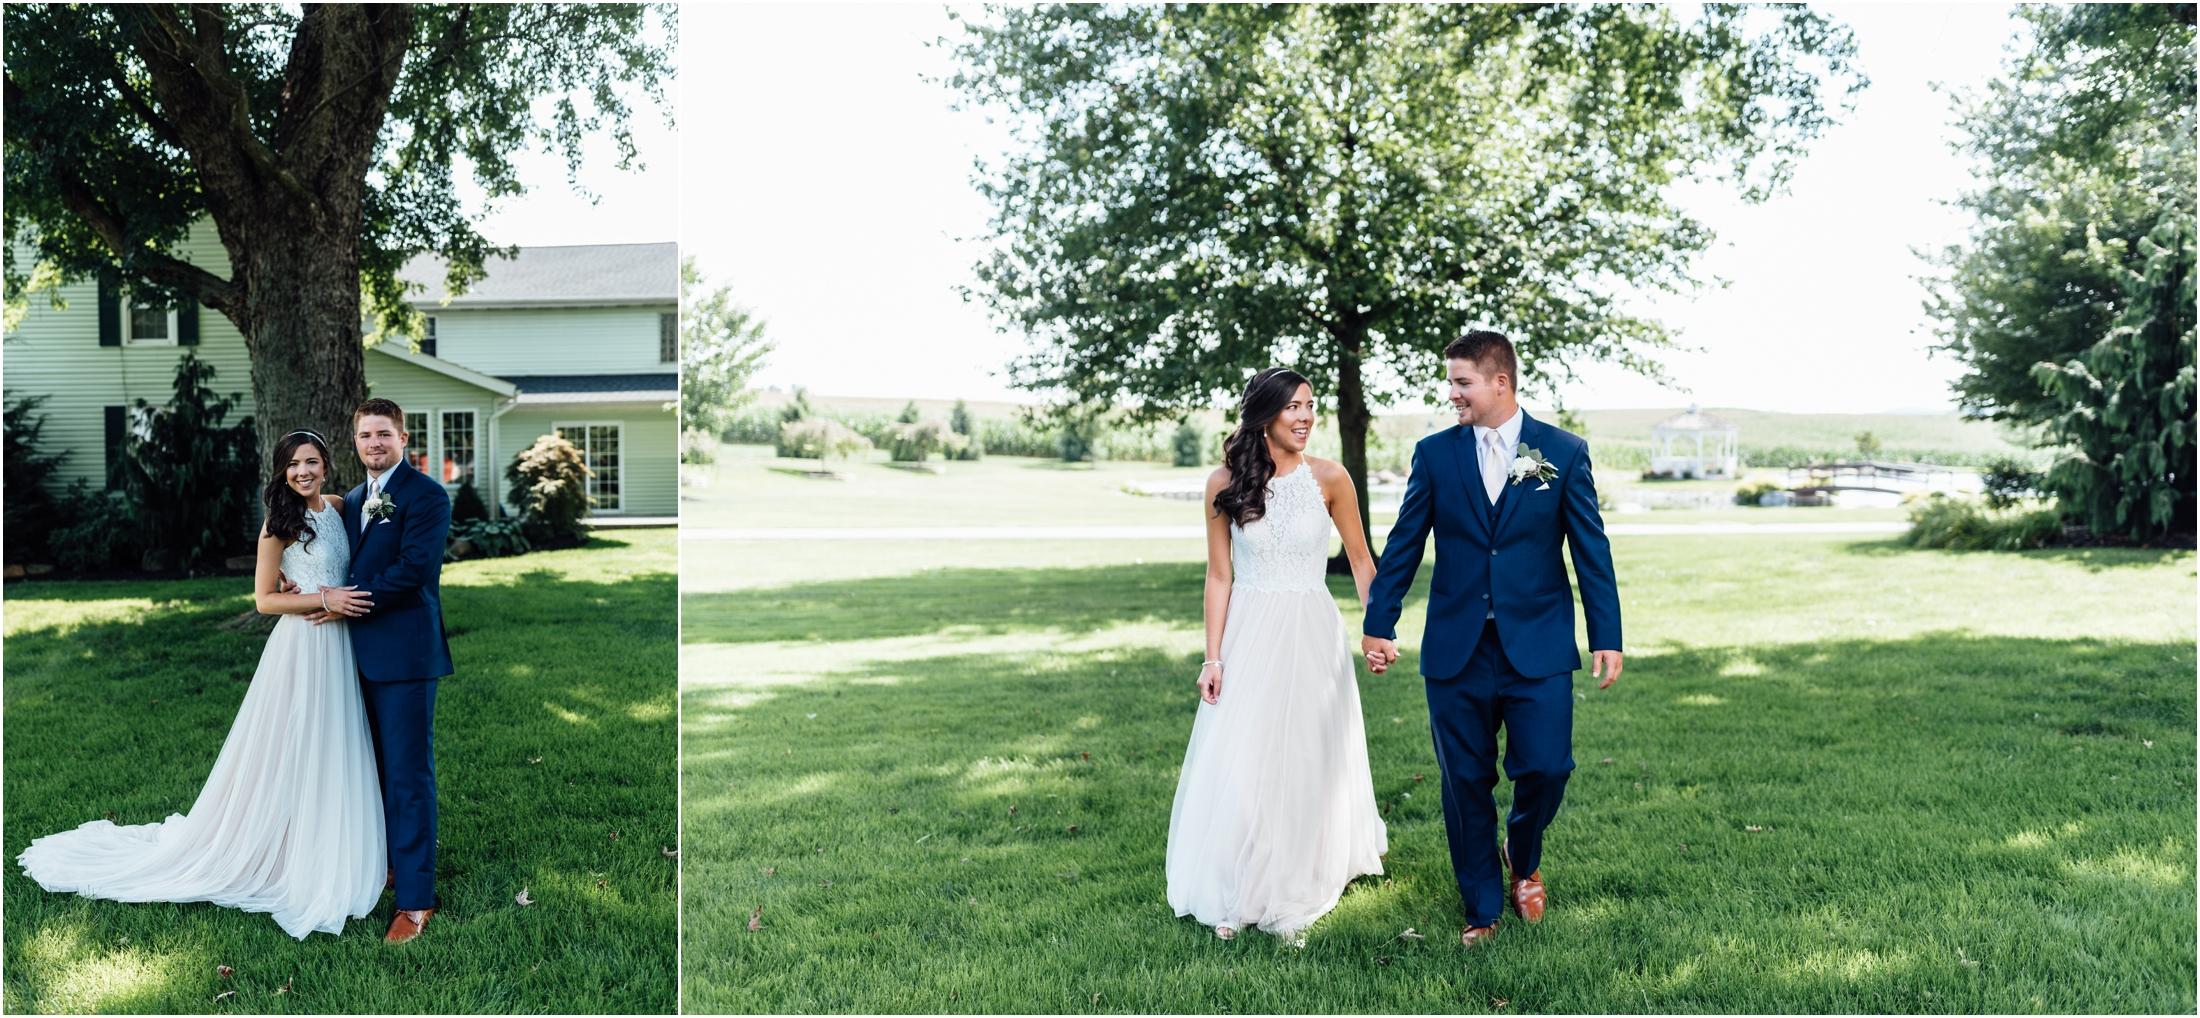 Steph&Bryan_Lancaster_wedding_farm_0508.jpg